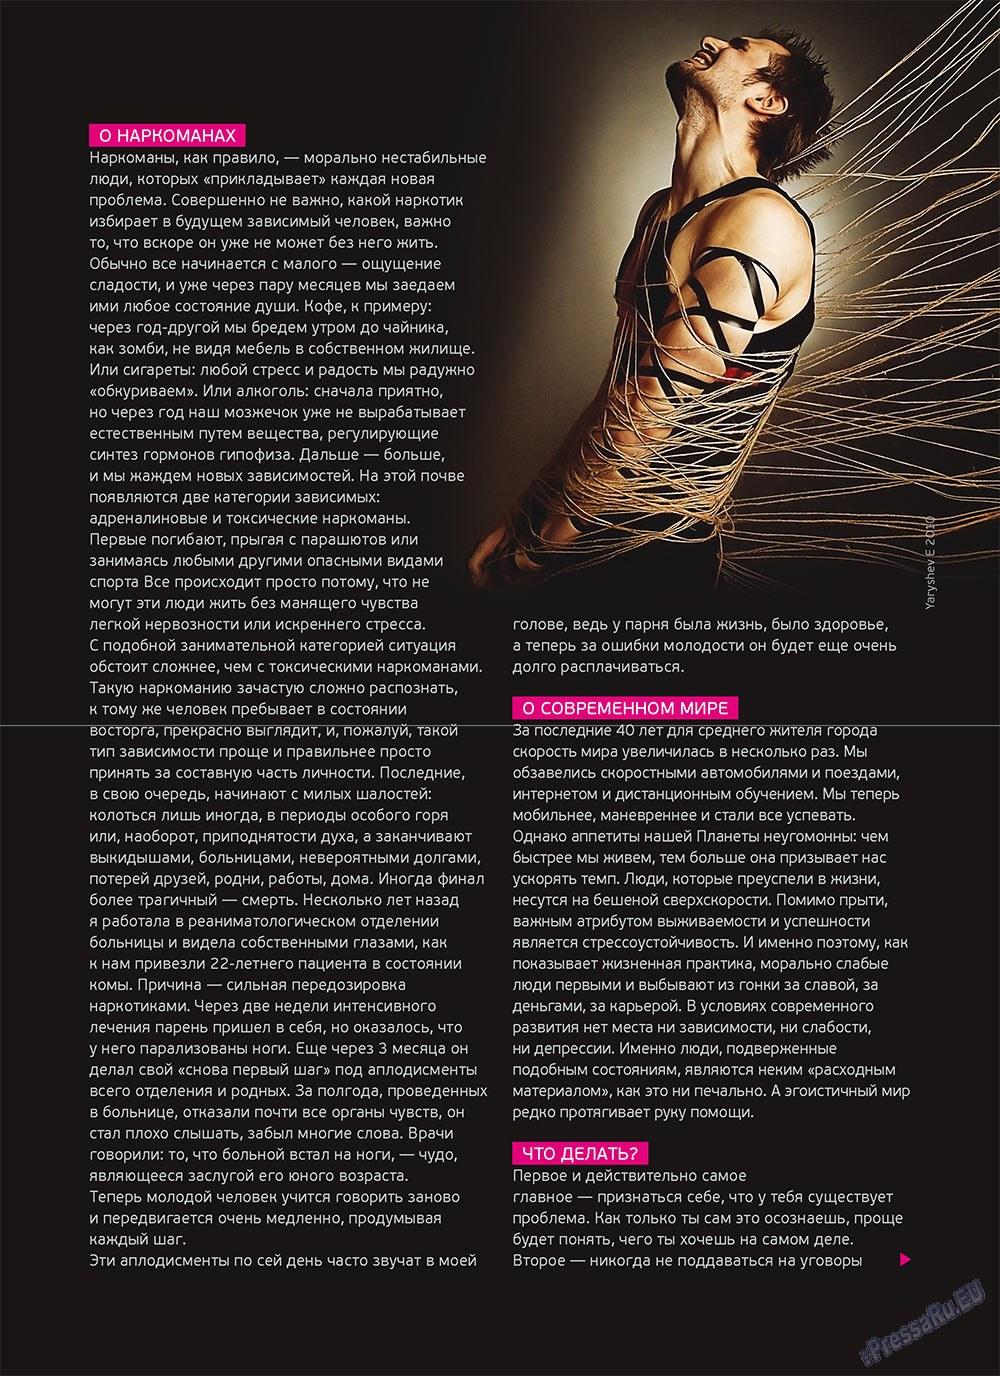 Артек (журнал). 2011 год, номер 4, стр. 13